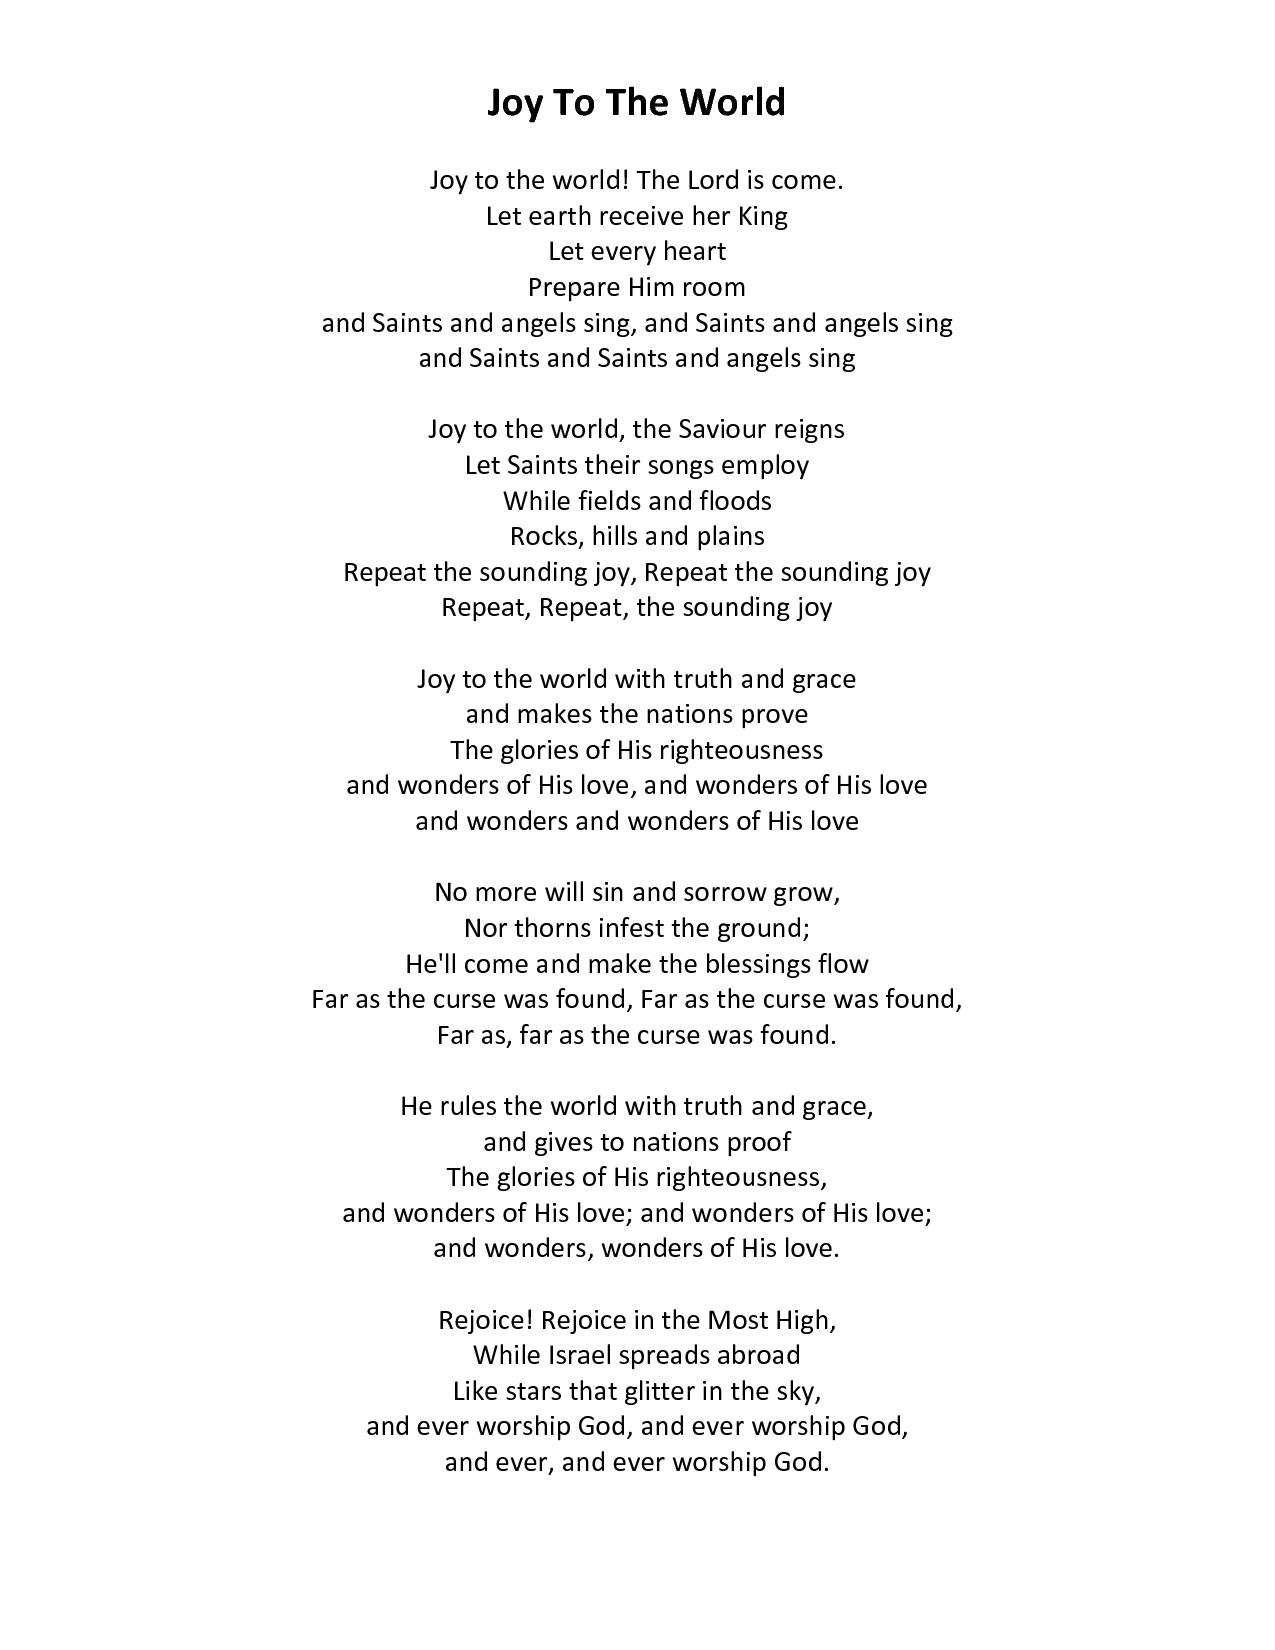 Angels Singing Joy to the World | Joy To The World Joy to the world ...